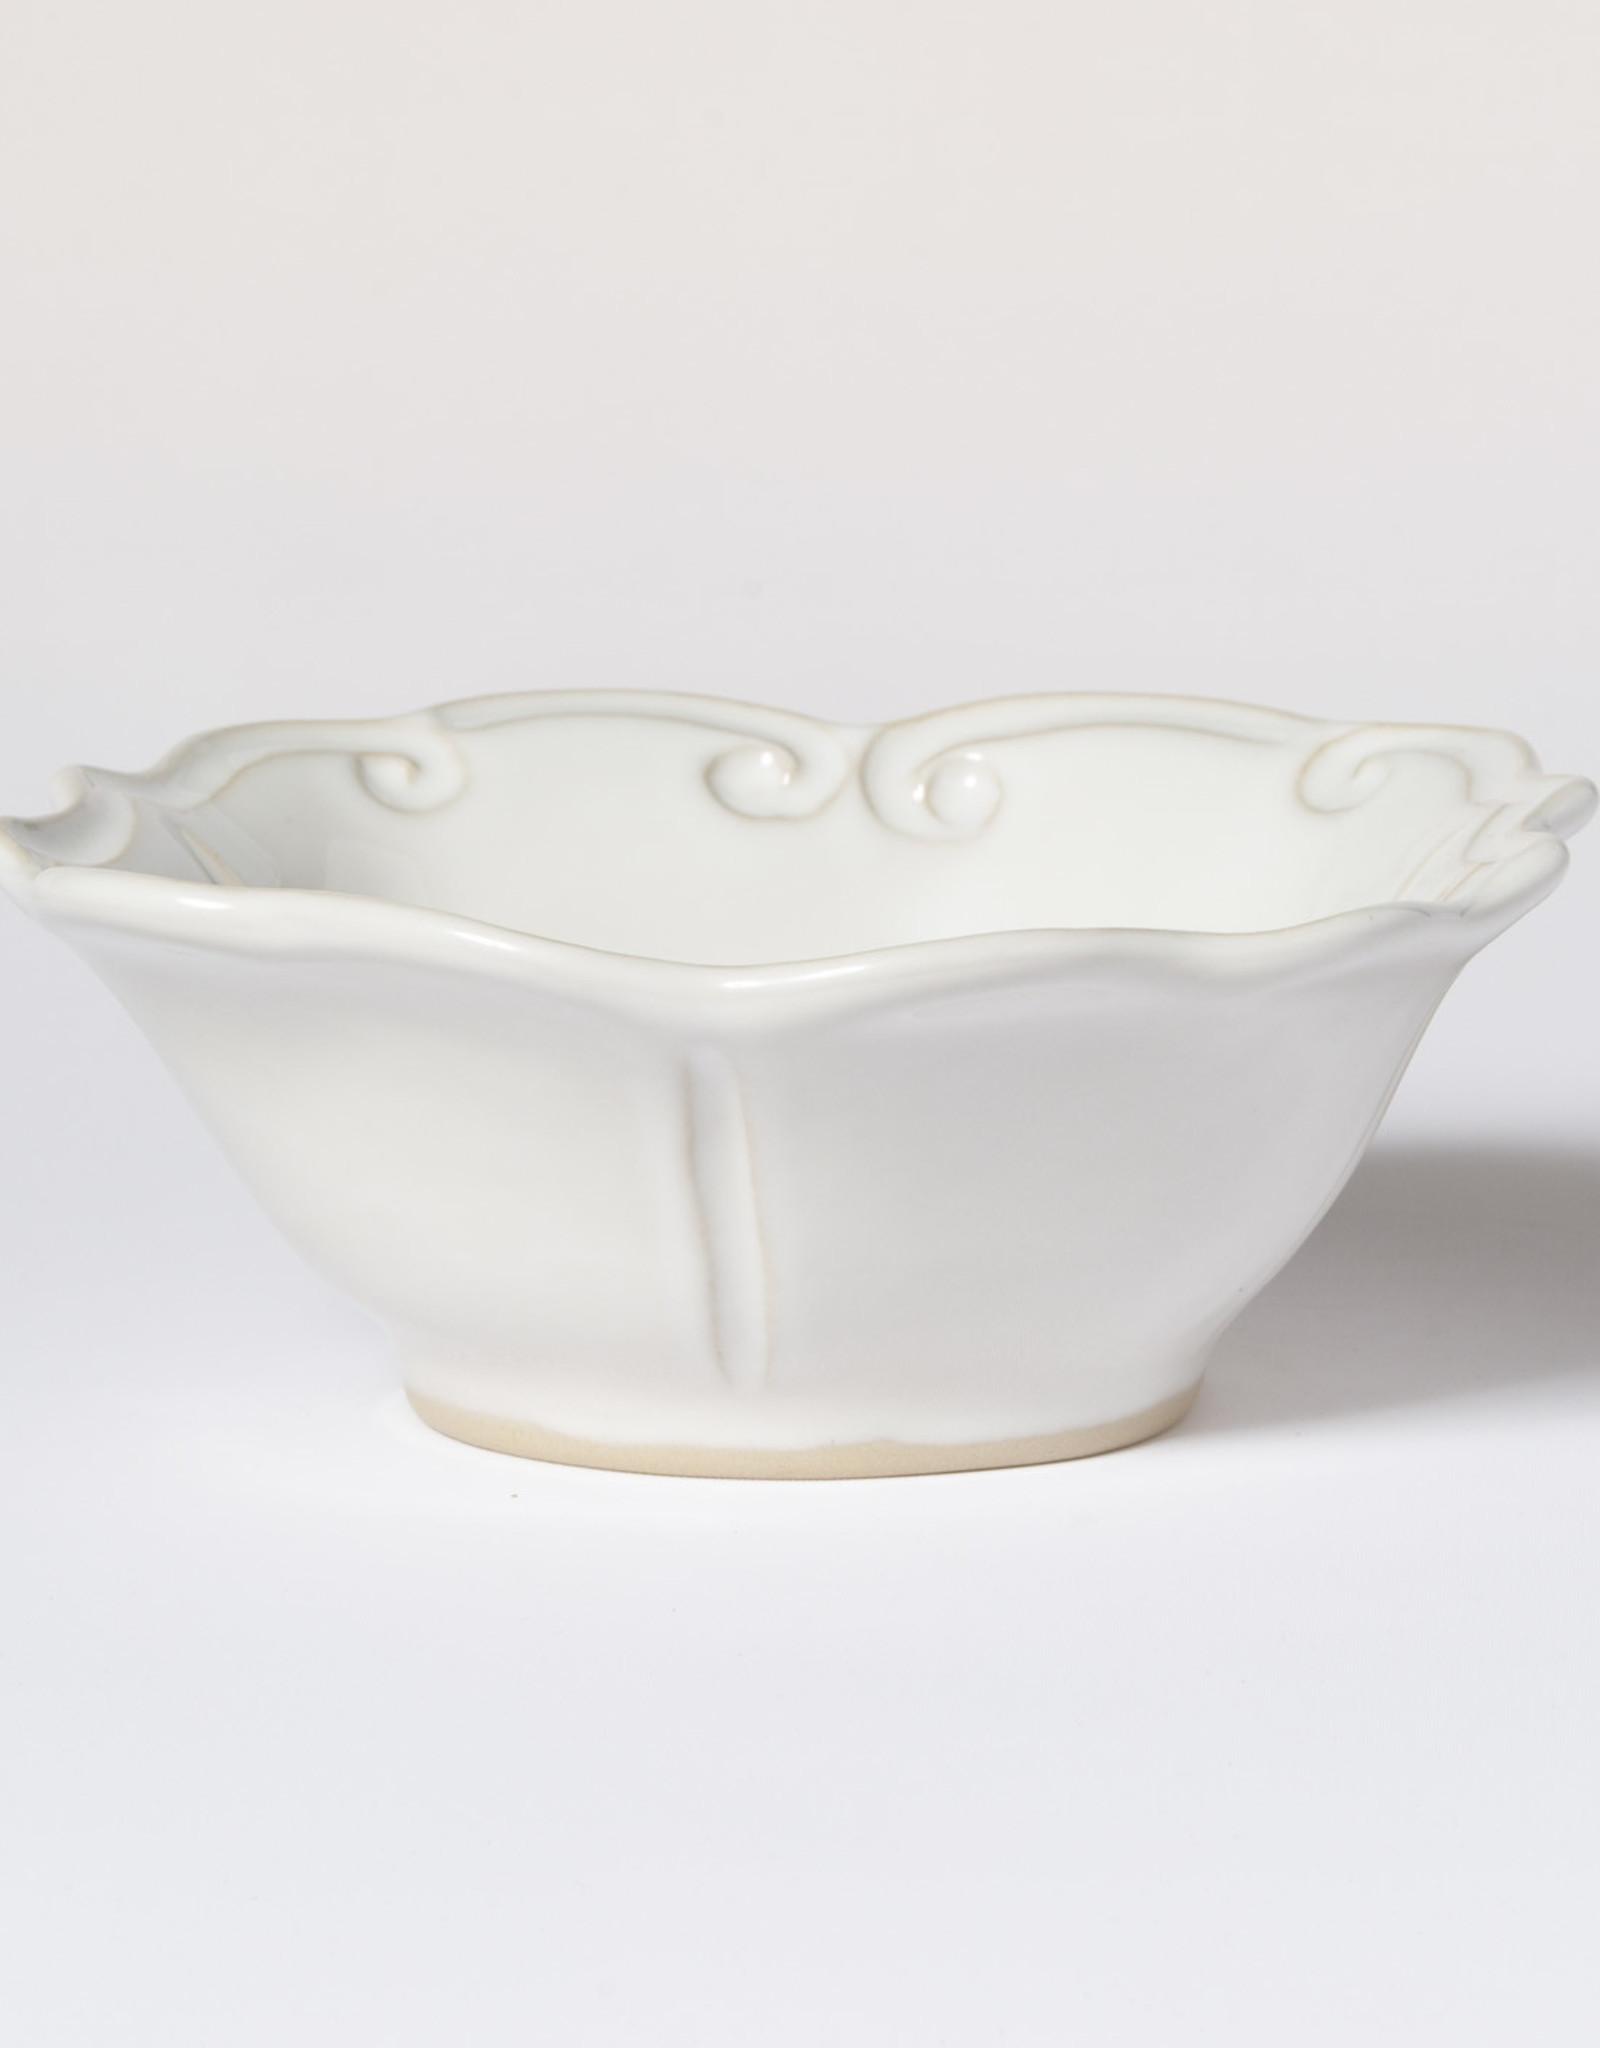 Vietri Incanto Stoneware White Baroque Cereal Bowl